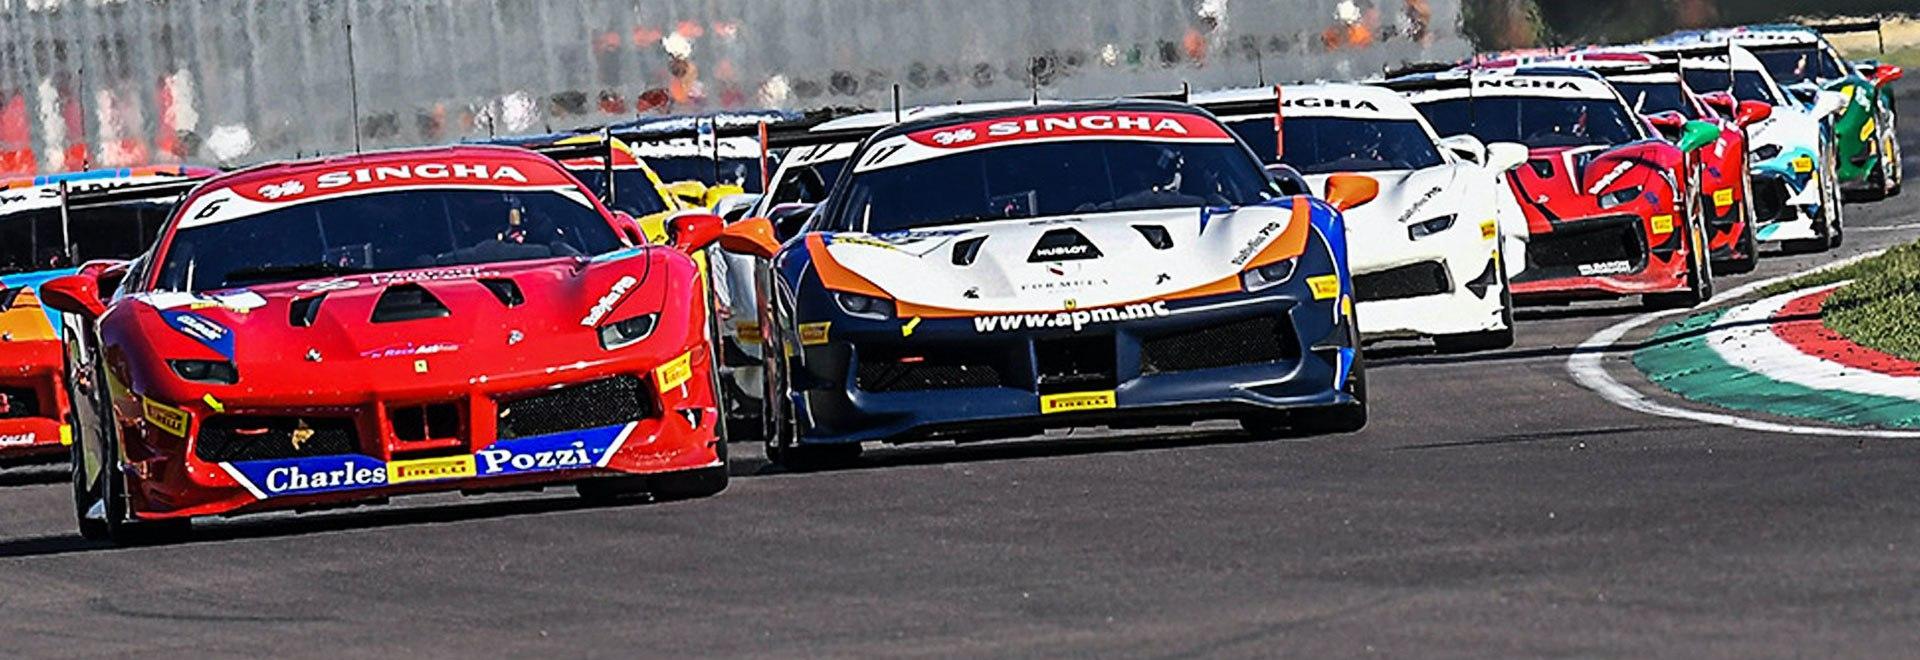 Trofeo Pirelli Misano. Gara 2